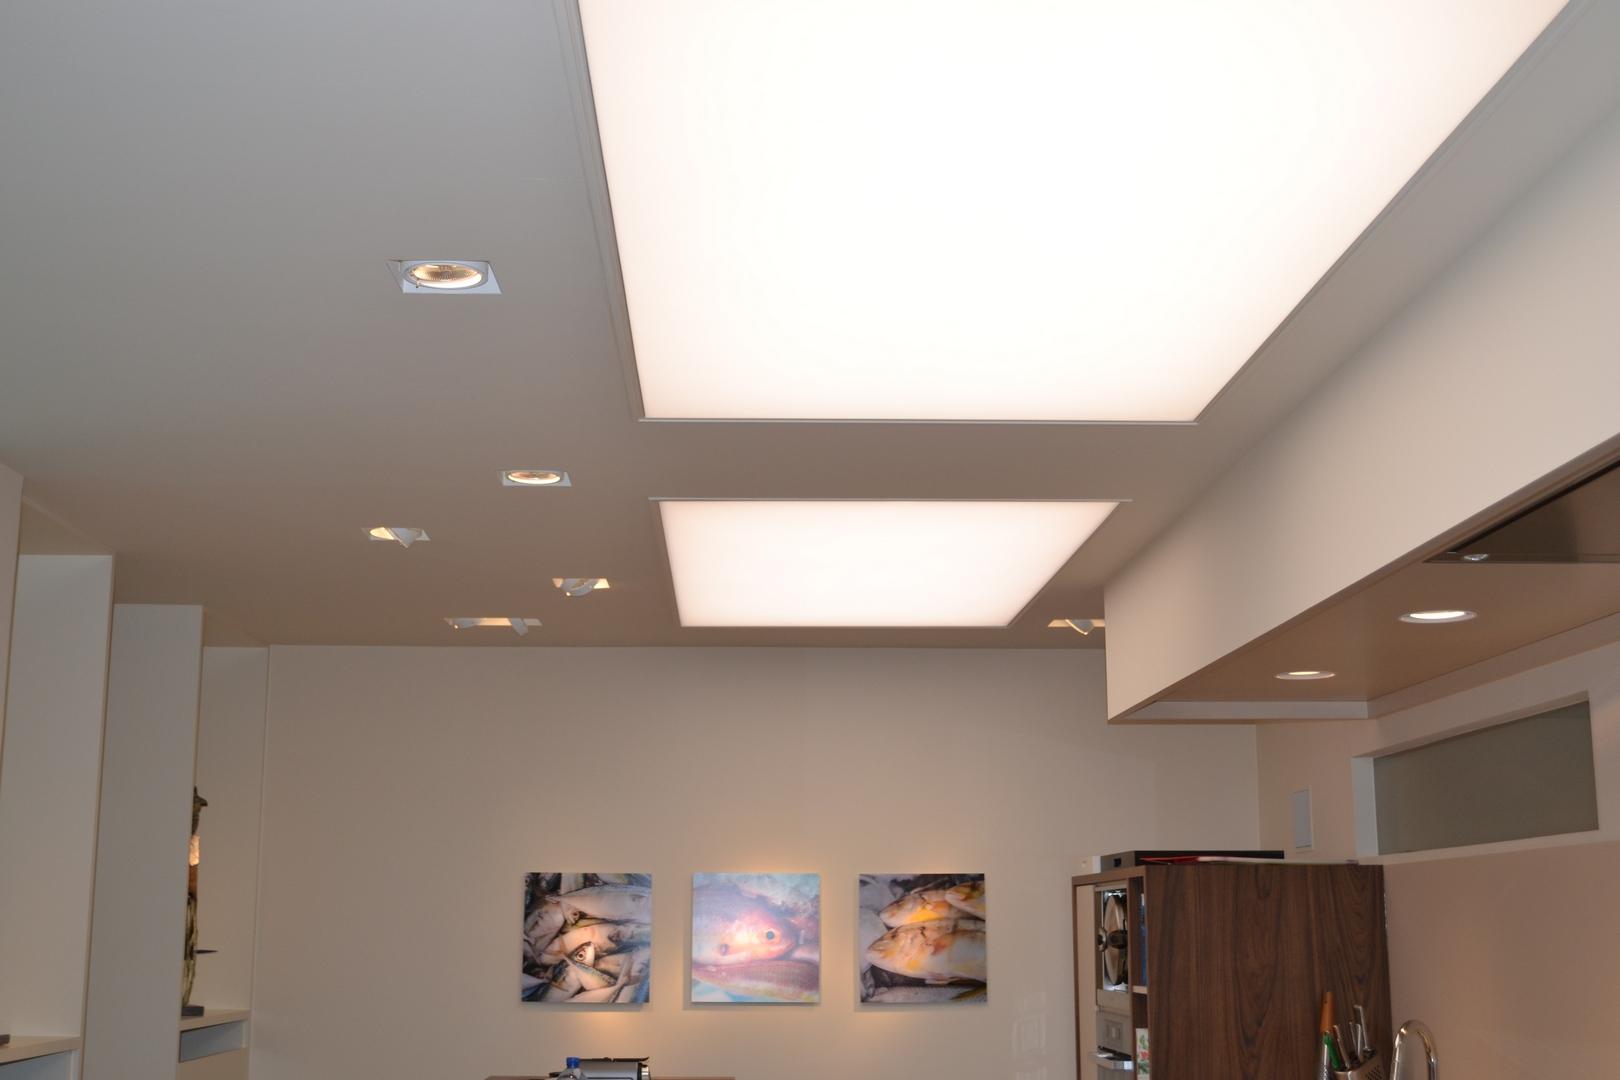 skylight - Jan baptist elektriciteitswerken